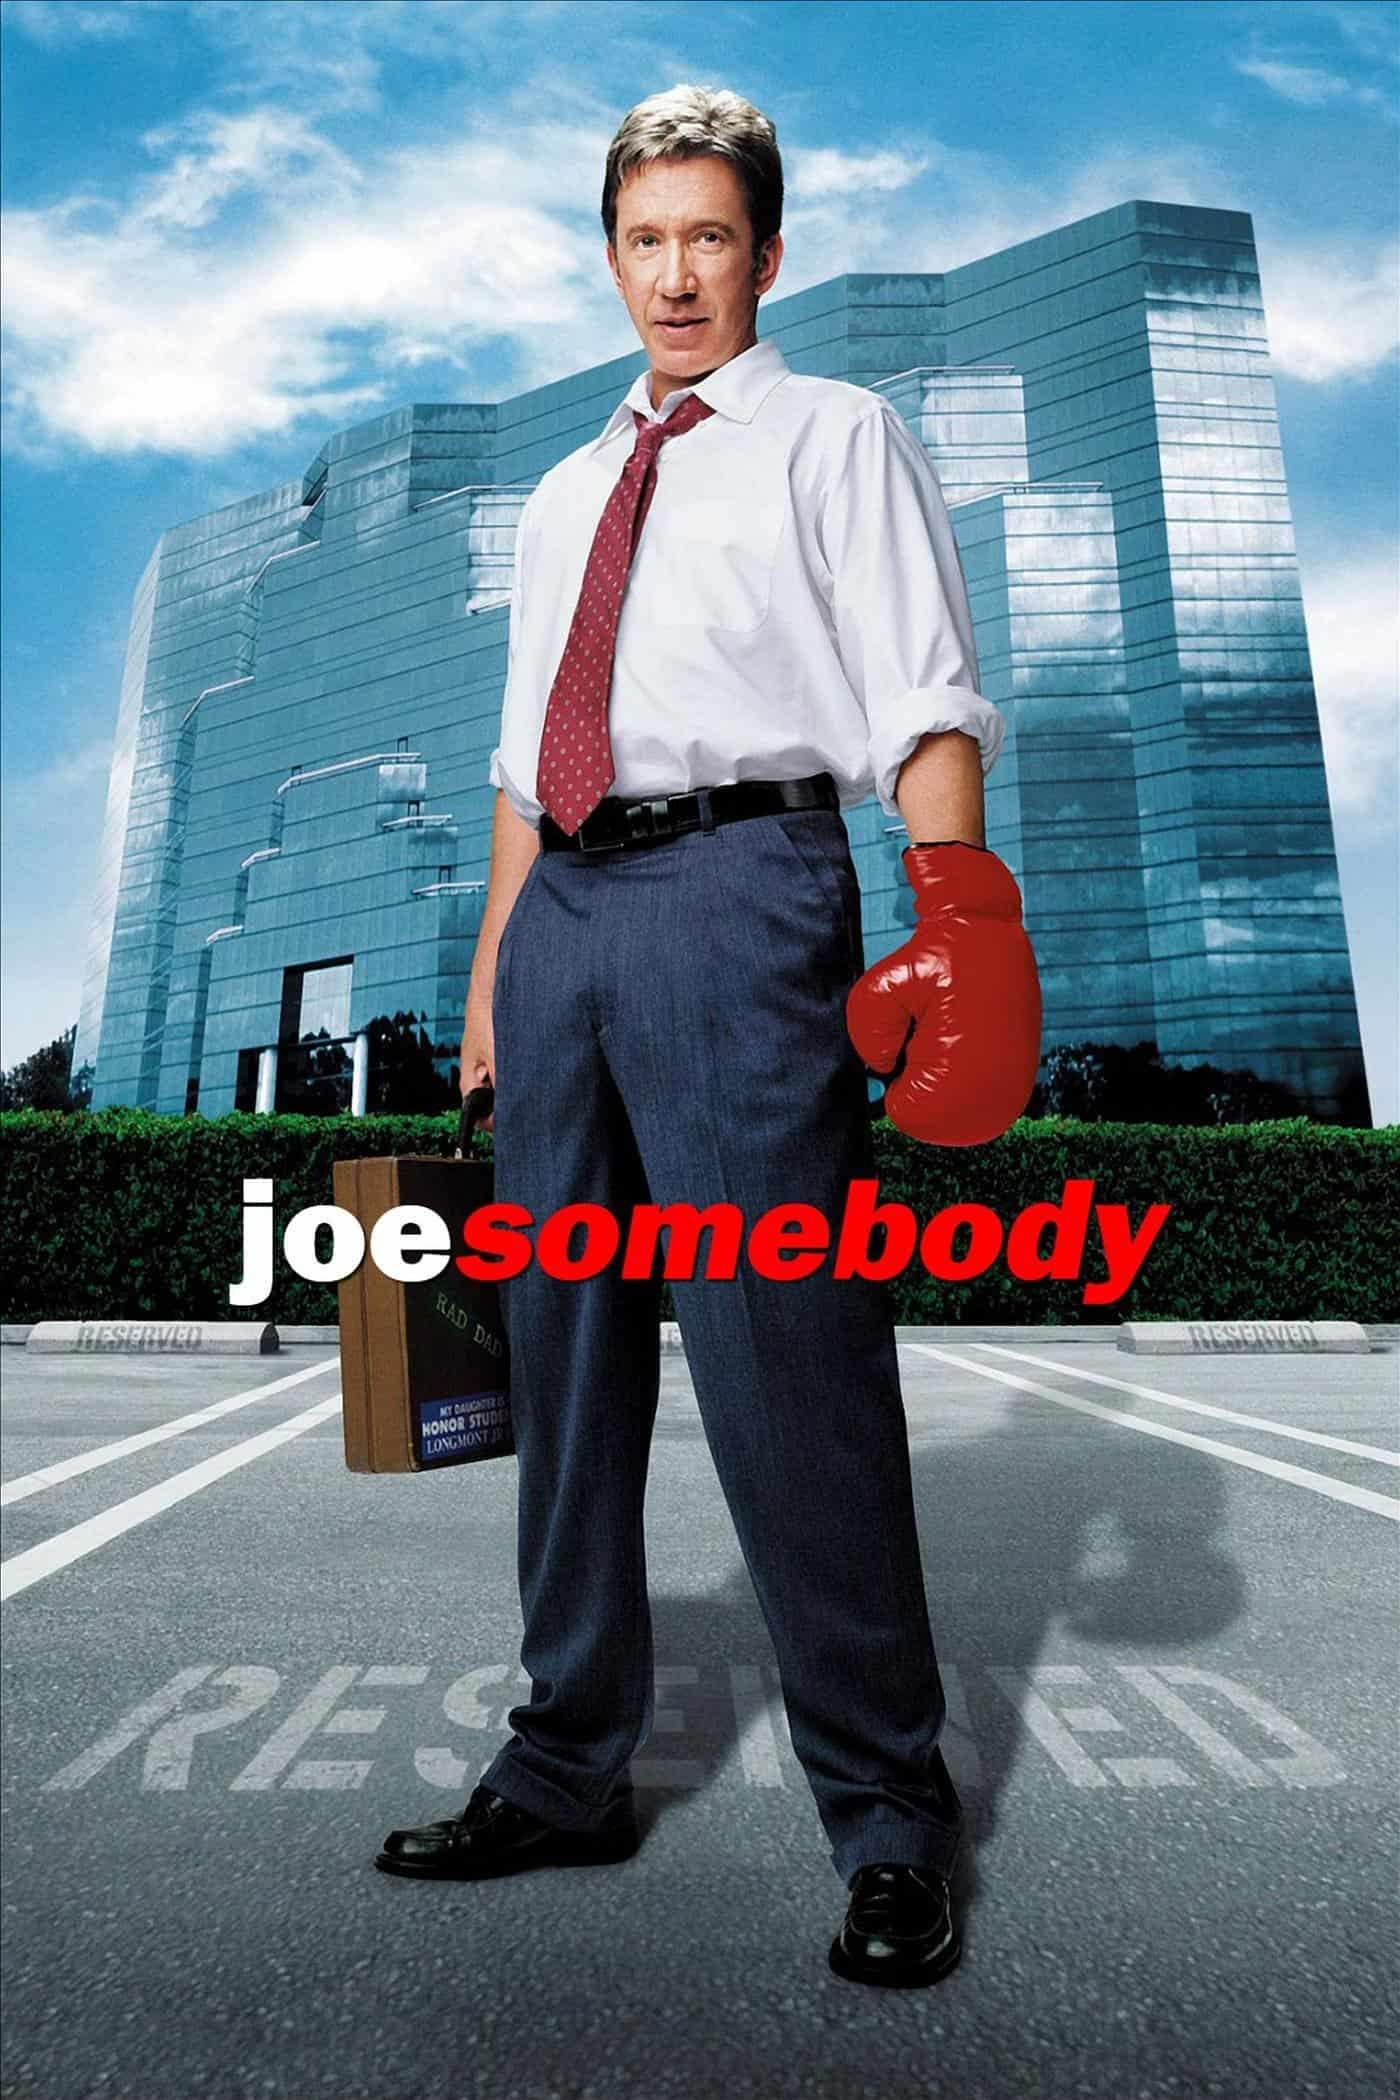 Joe Somebody, 2001